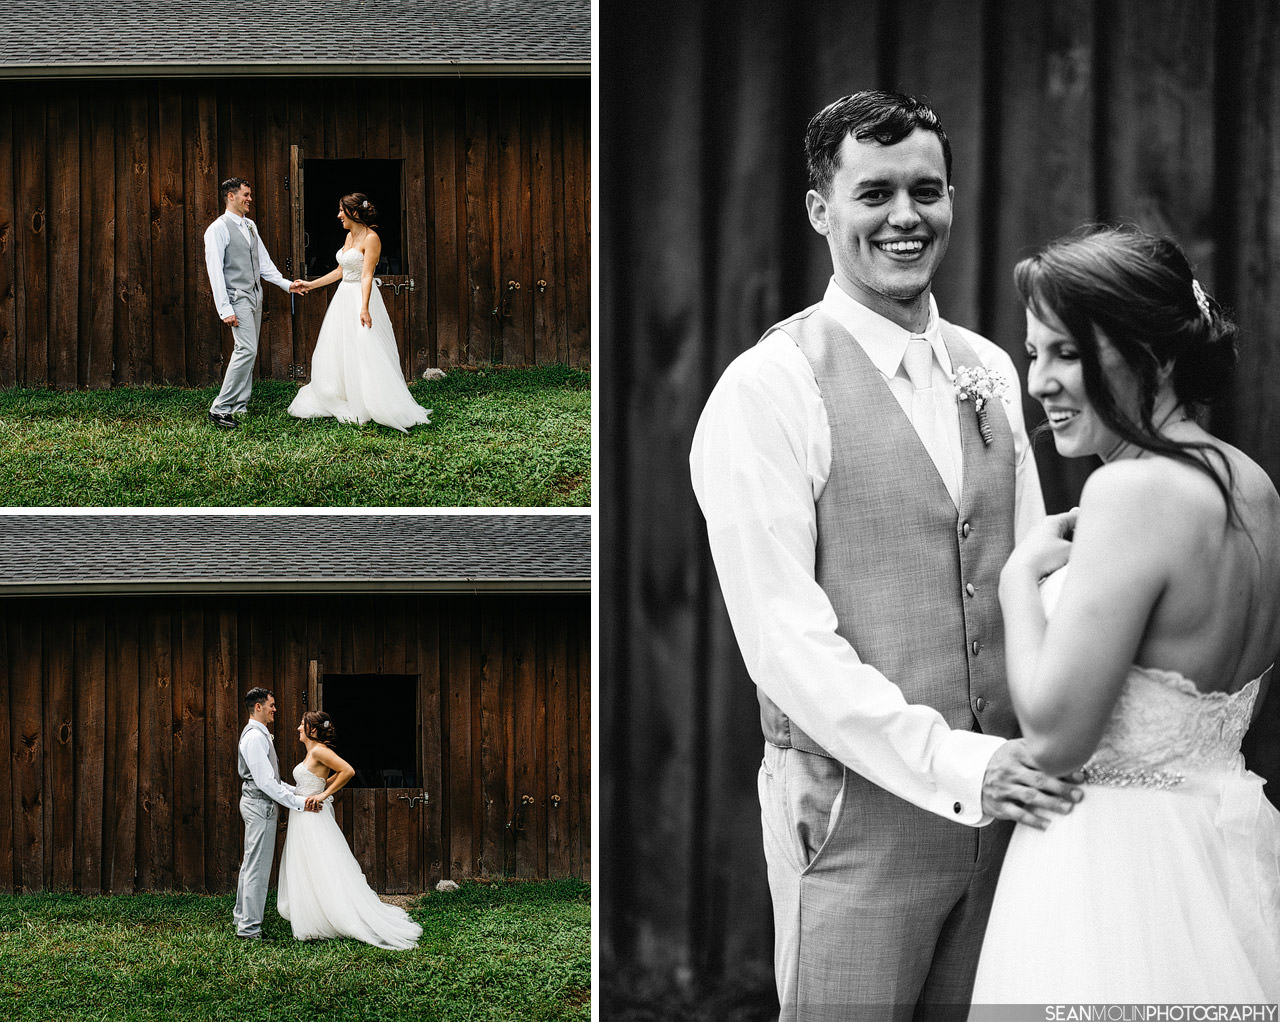 022-bride-groom-first-look-jessica-eric-uhlir-barn-zionsville-indiana-wedding.jpg